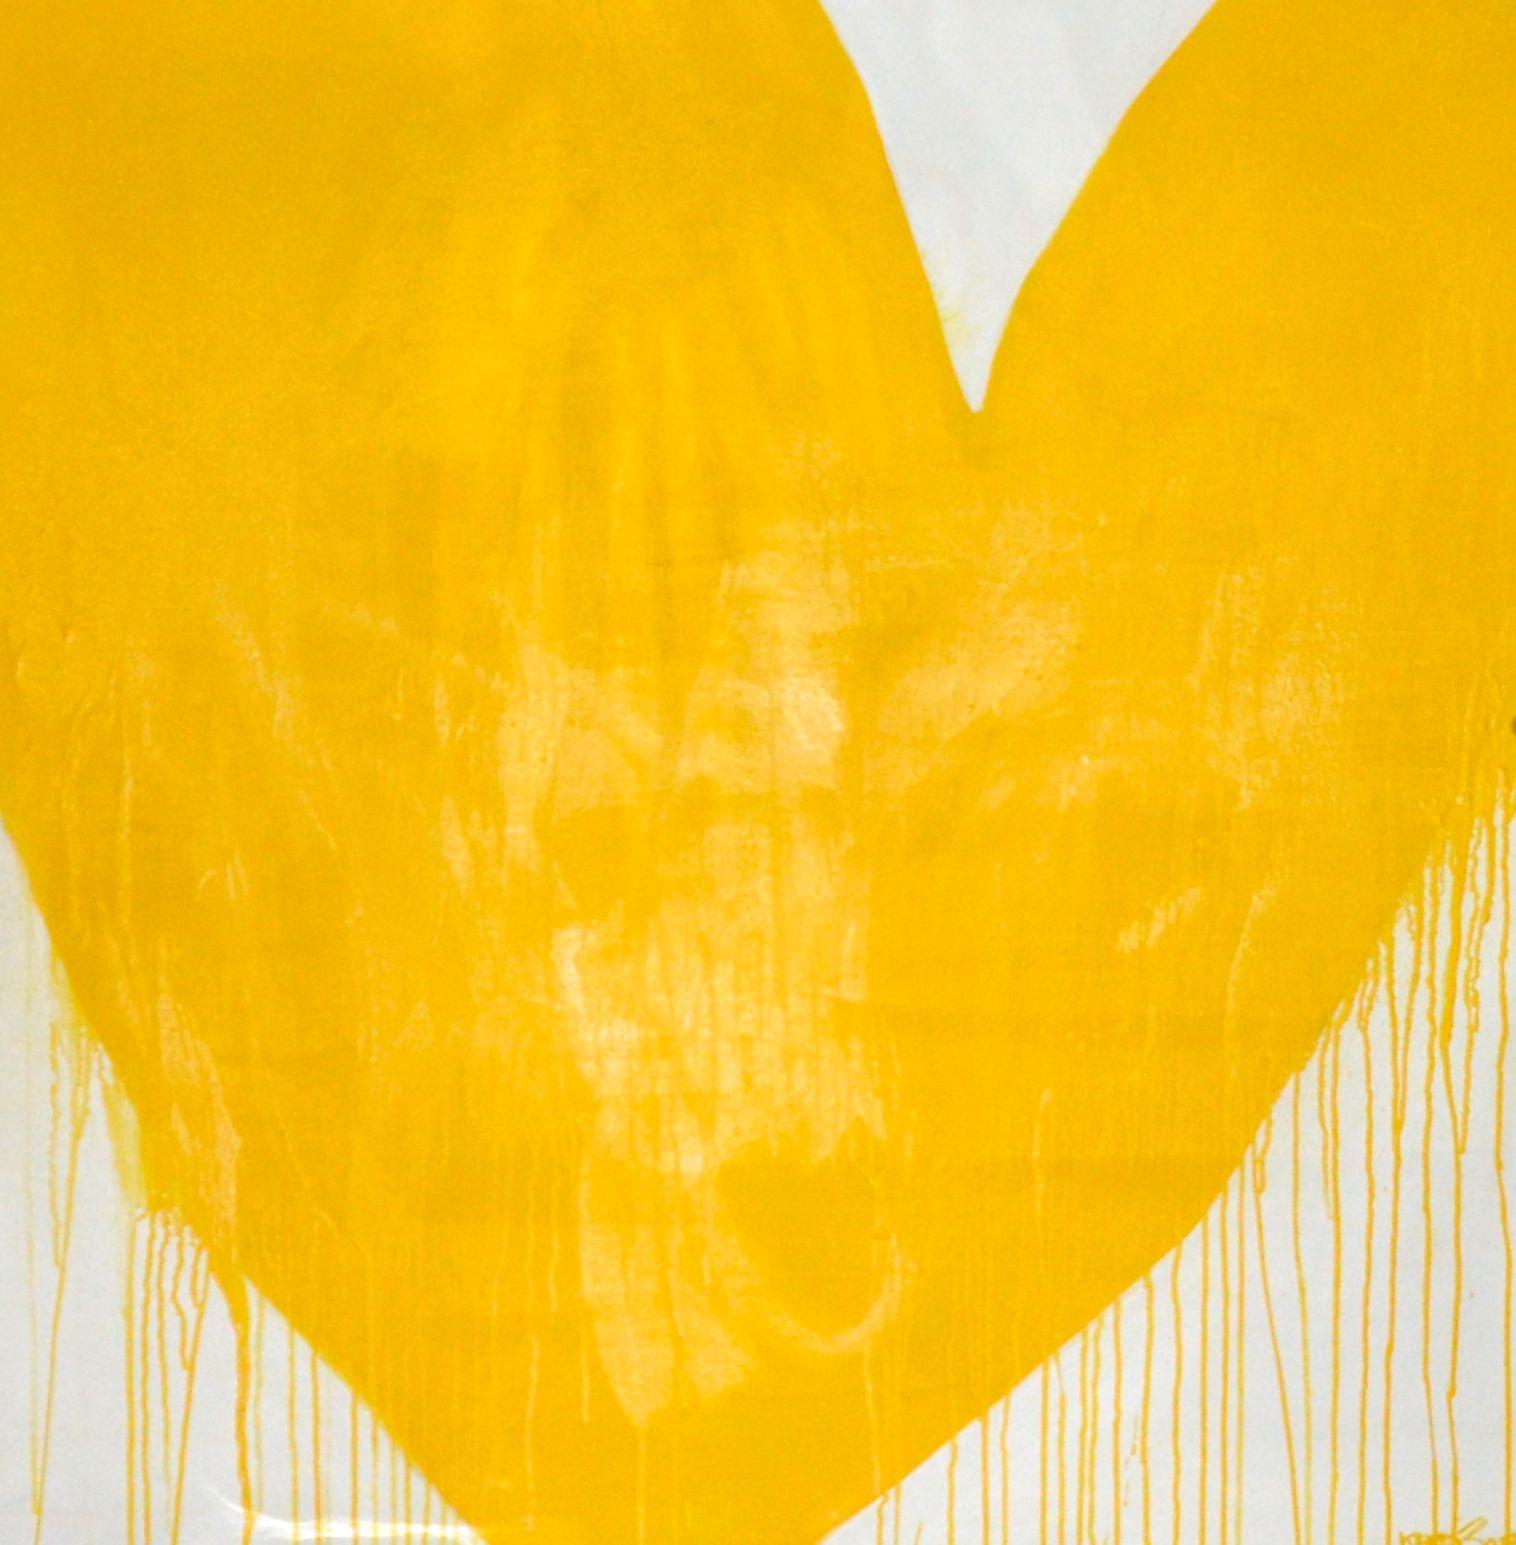 Kerri Rosenthal ART Drippy 60 Commission  kerri@kerrirosenthalstudio.com